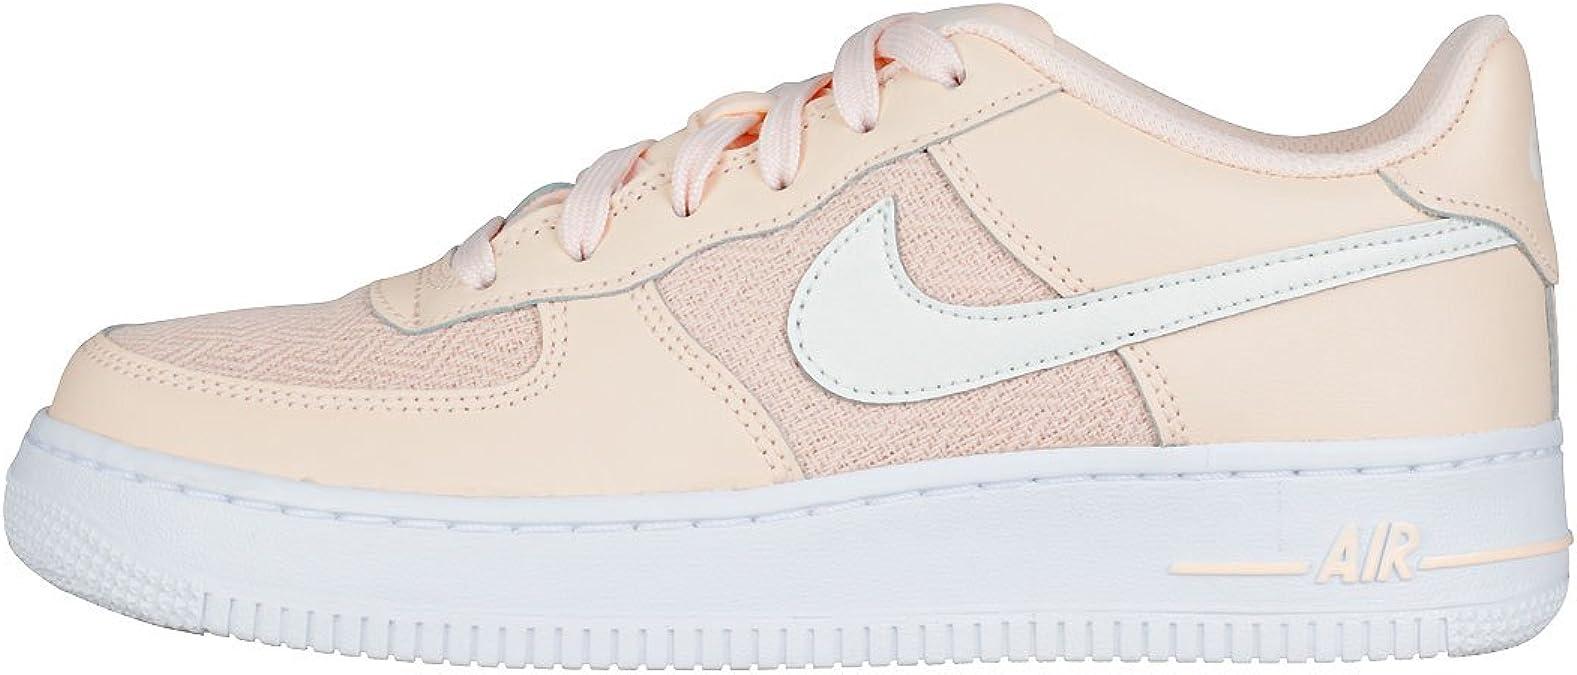 Nike Scarpe Air Force 1 LV8 (GS) TG 36 COD 849345 800